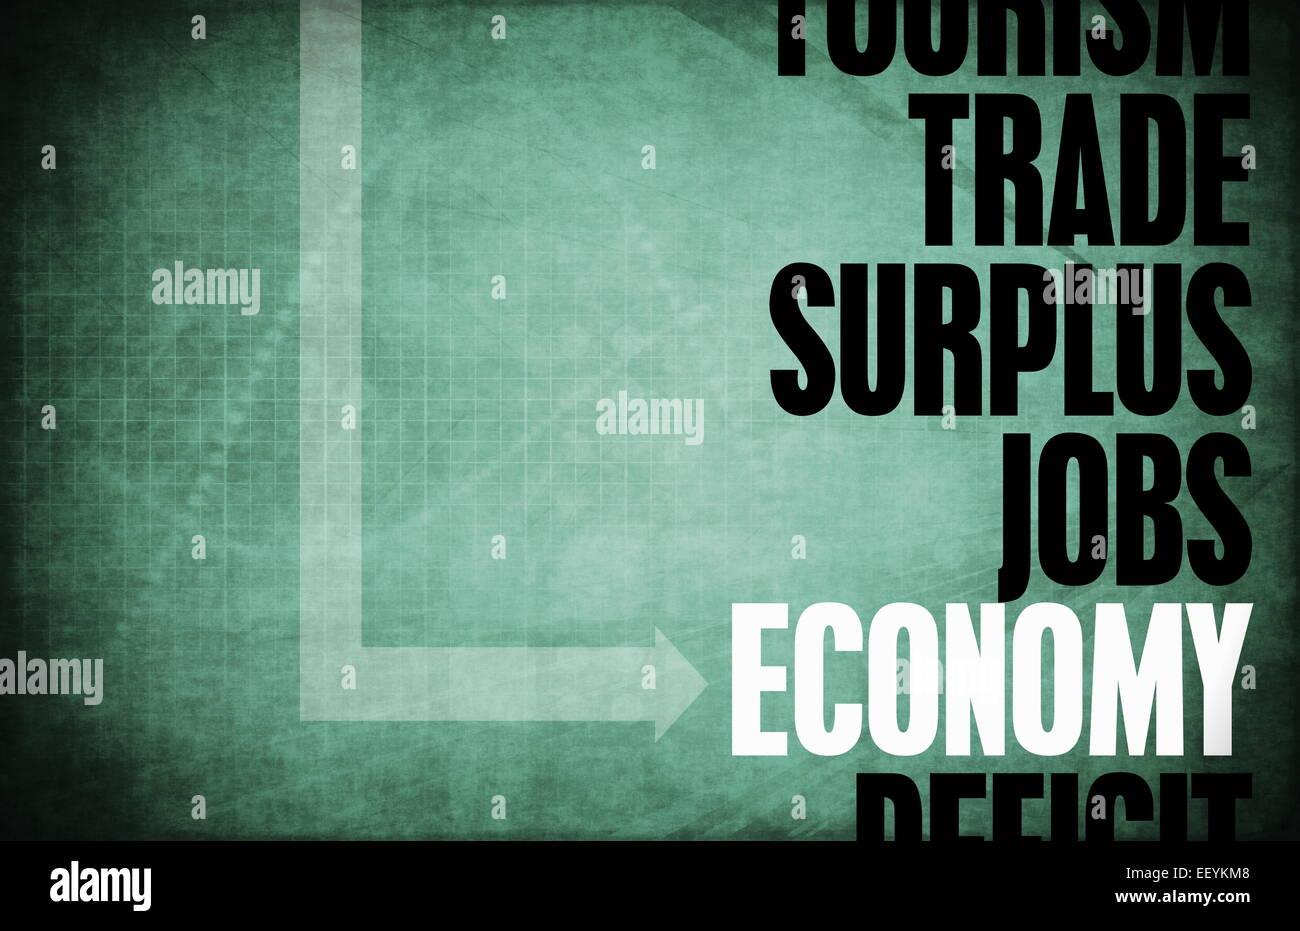 Basics Of Economics Stock Photos & Basics Of Economics Stock